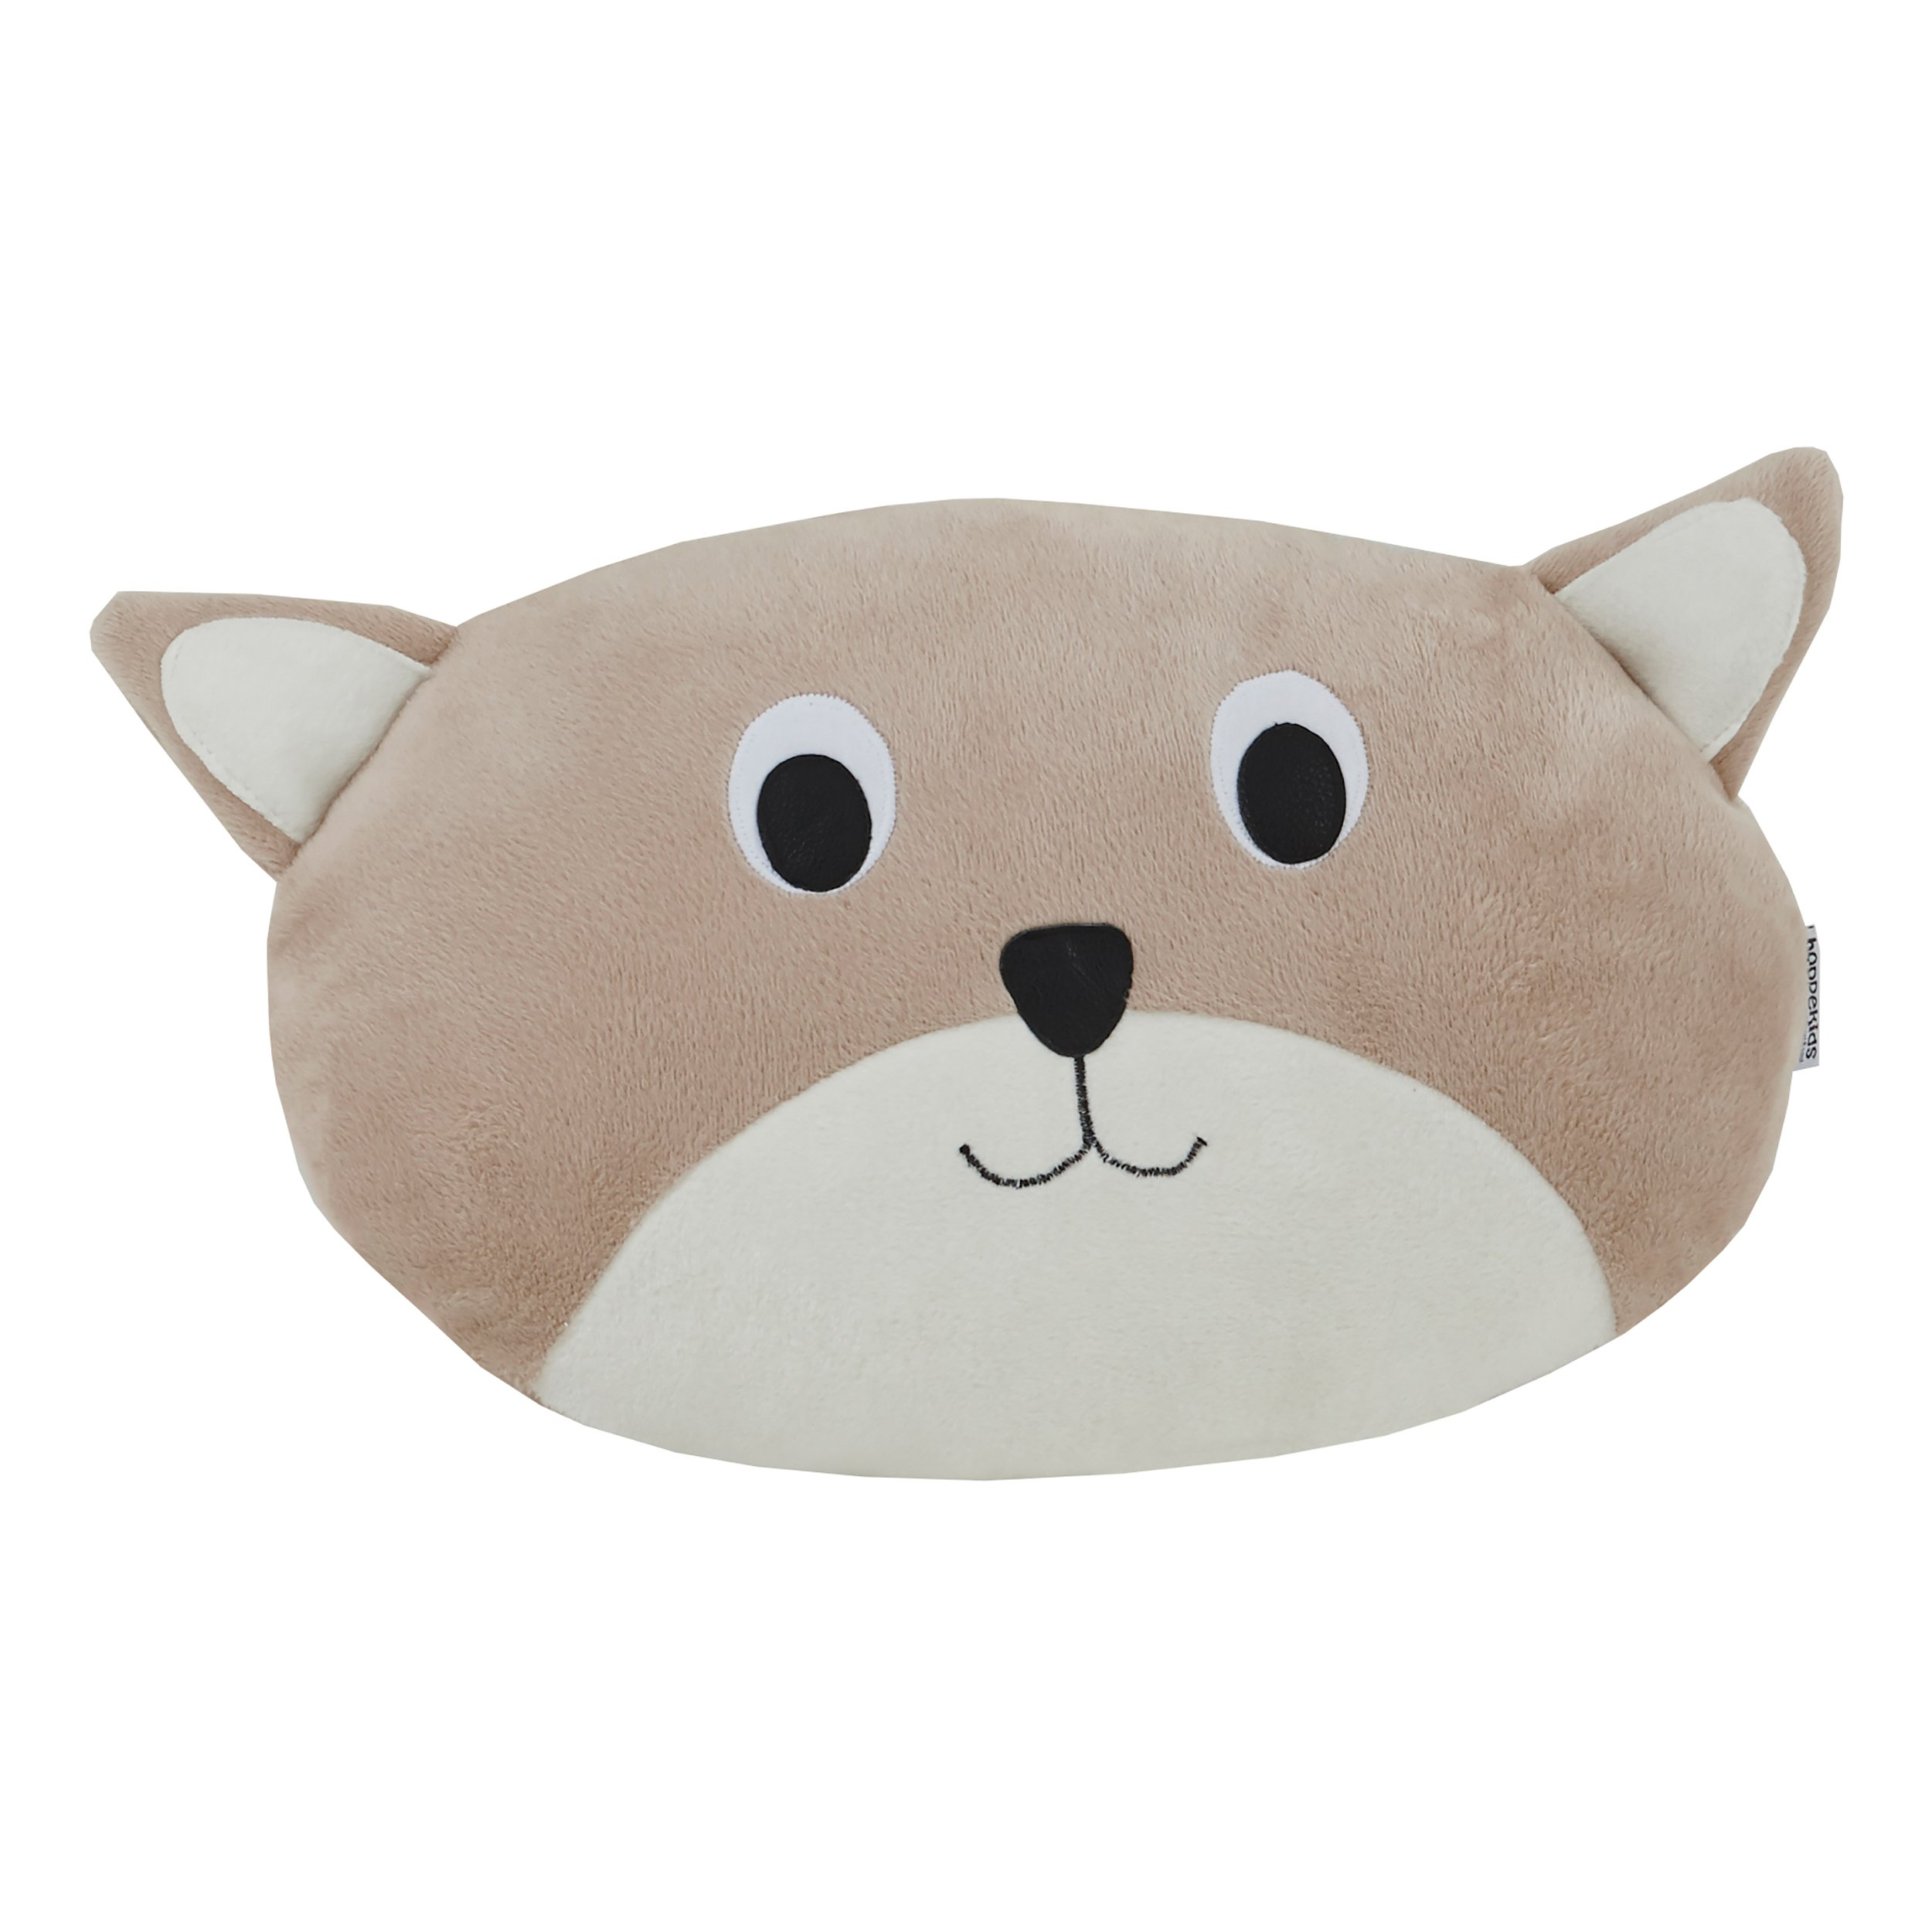 Hoppekids - Pets Cushion - Cat